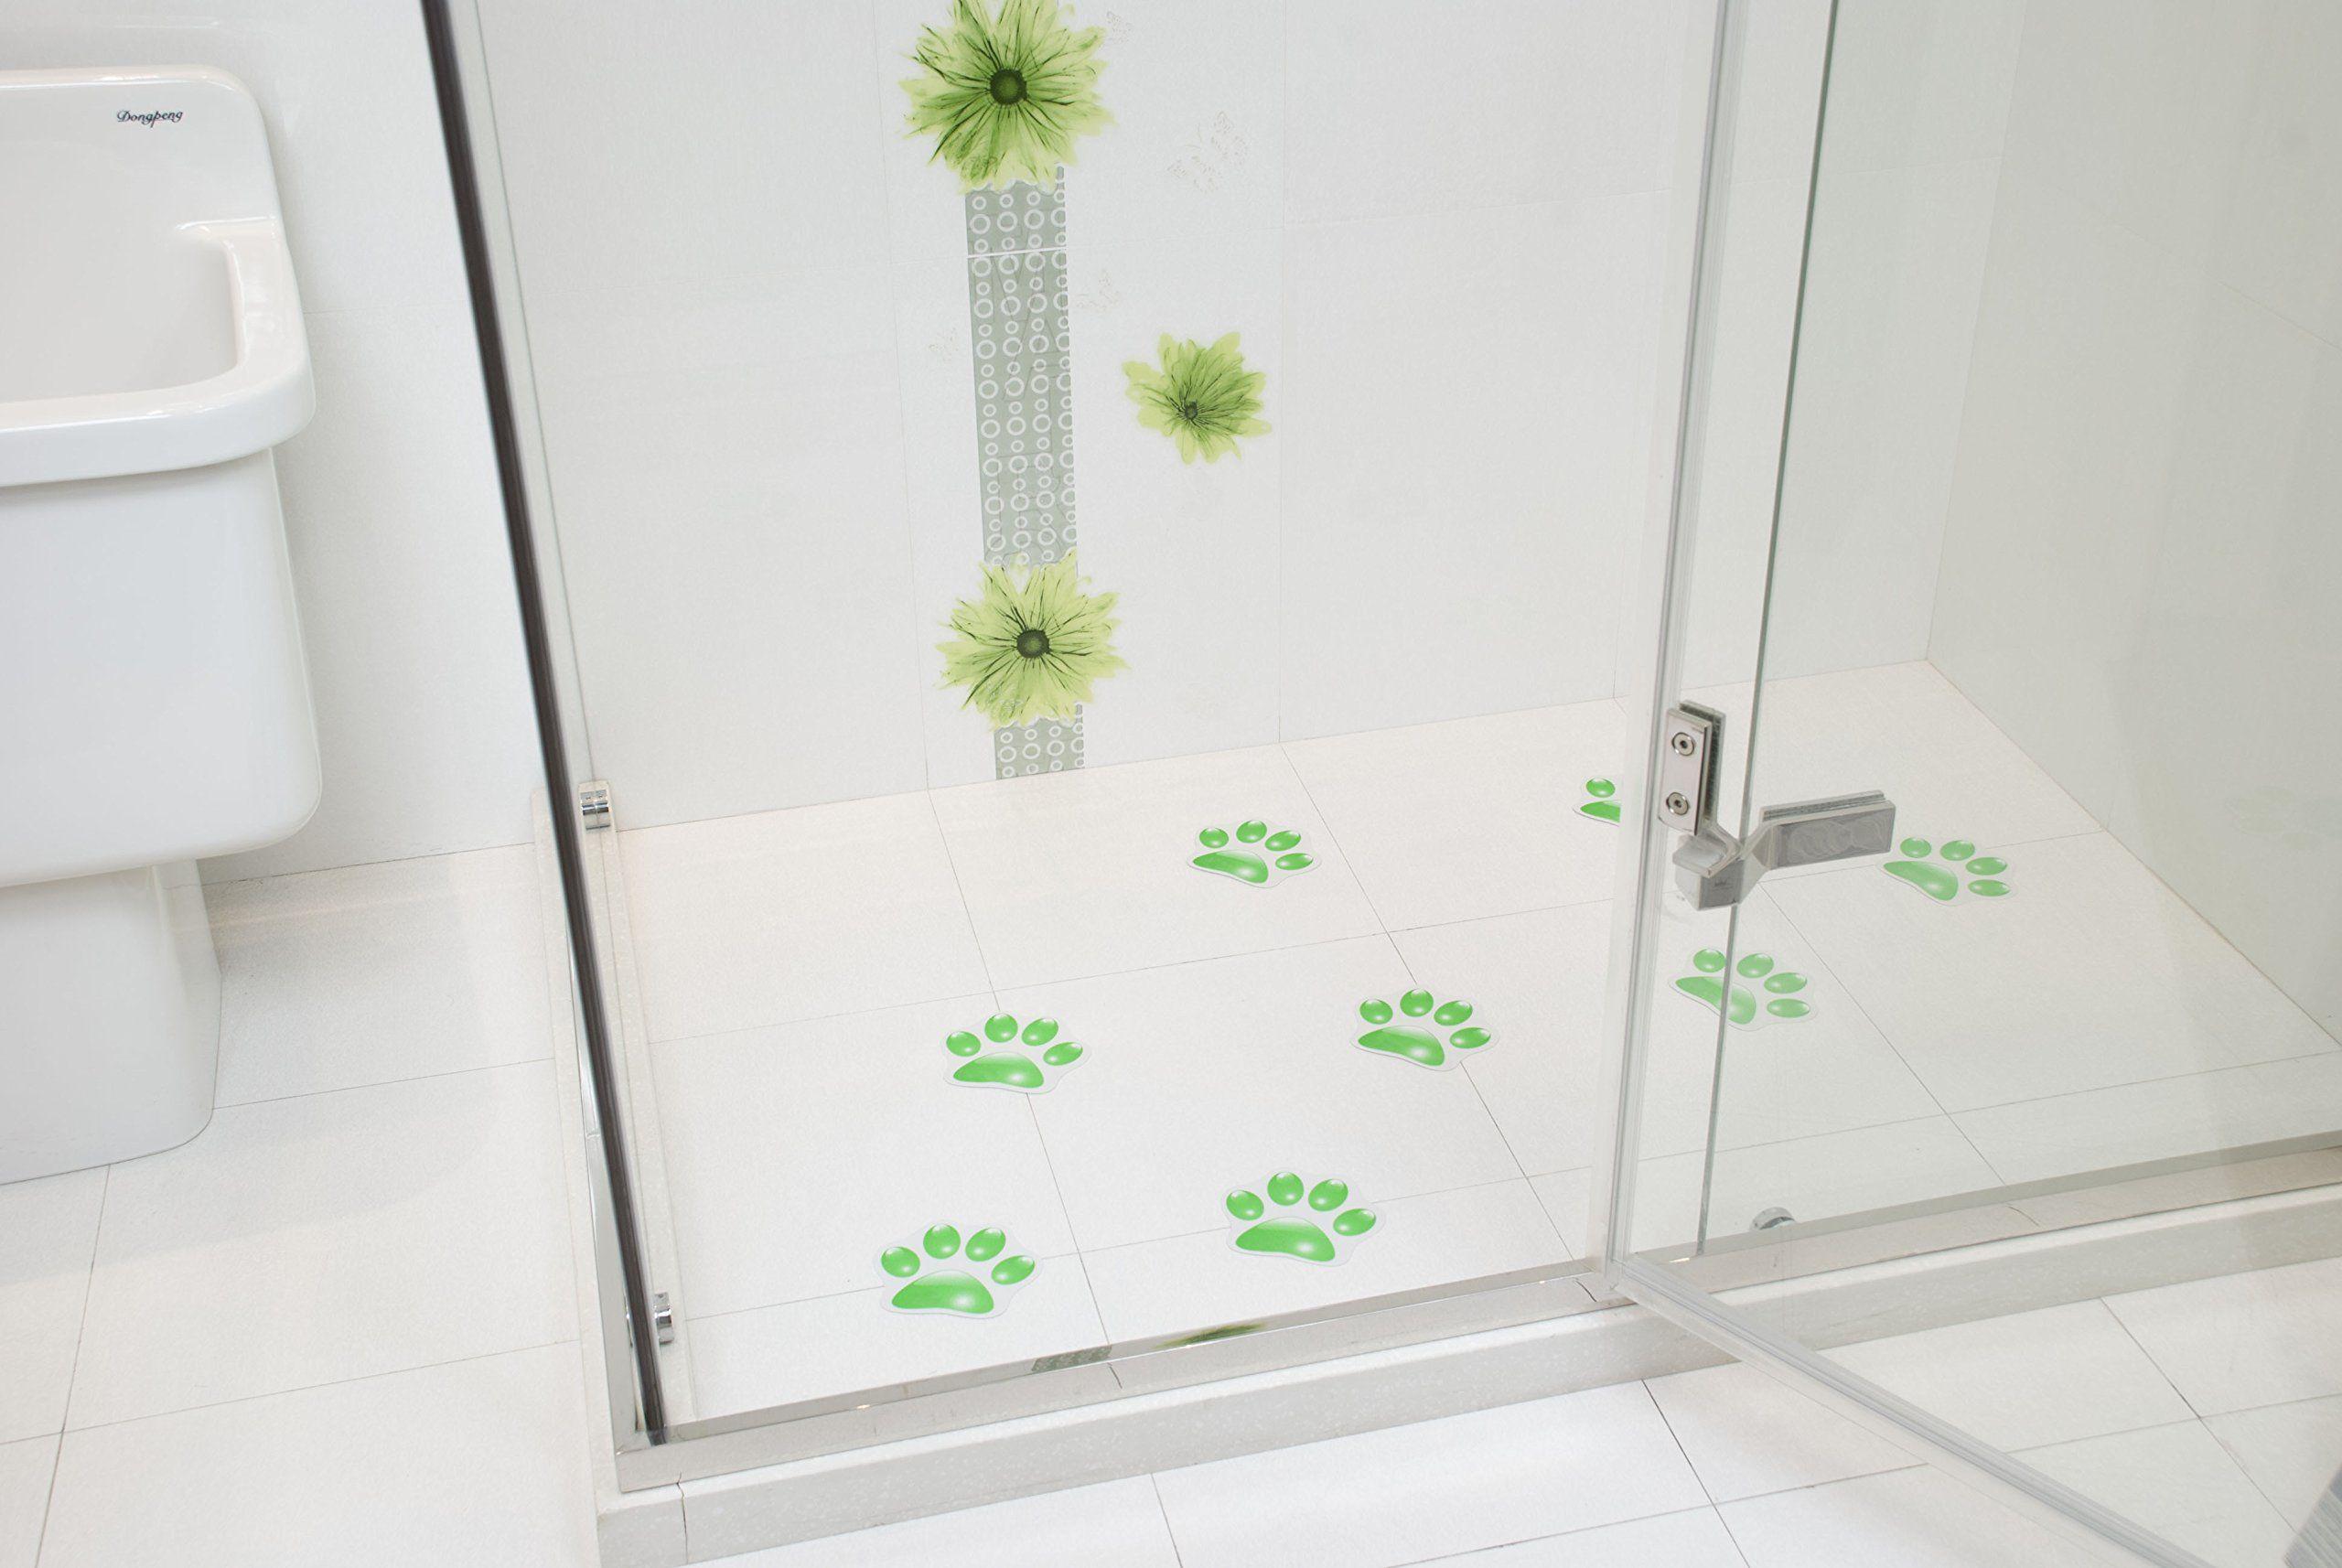 Lumenon Non Slip Bathtub Stickers For Child Safety Baby Bath Tub